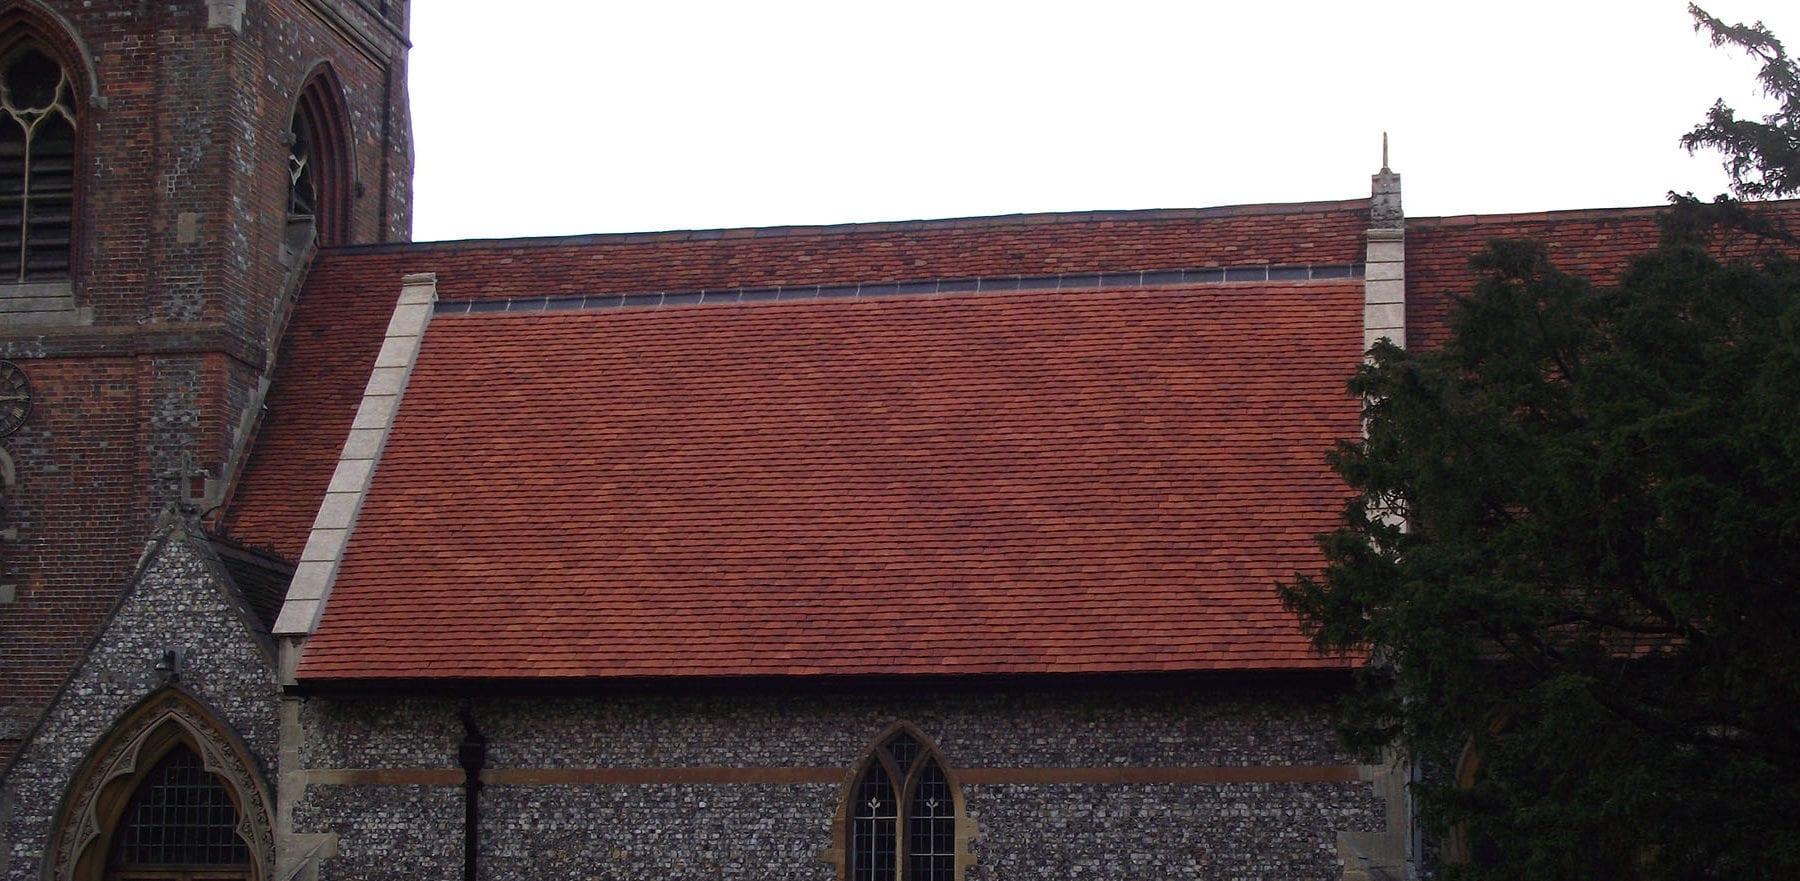 Lifestiles - Handmade Orange Clay Roof Tiles - Berkshire, England 4